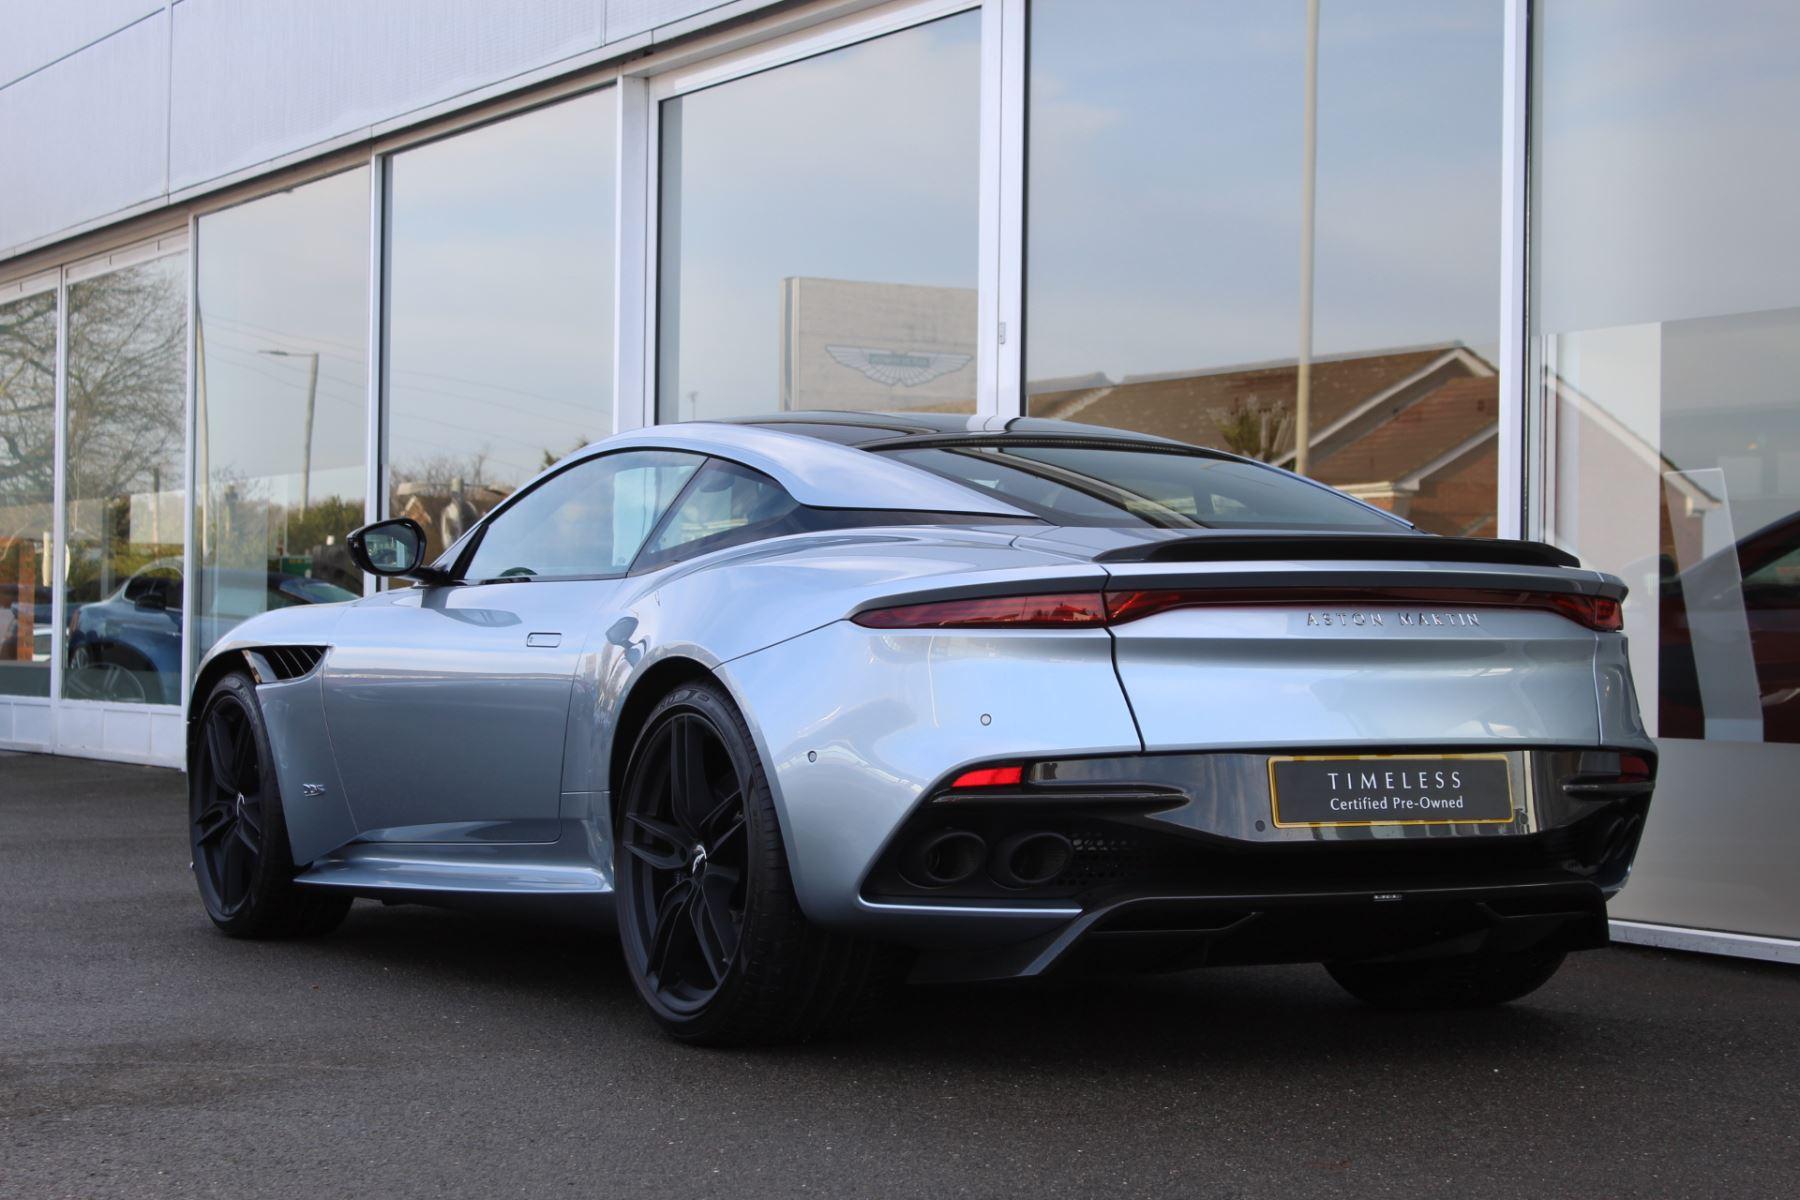 Aston Martin DBS Superleggera V12 2dr Touchtronic image 14